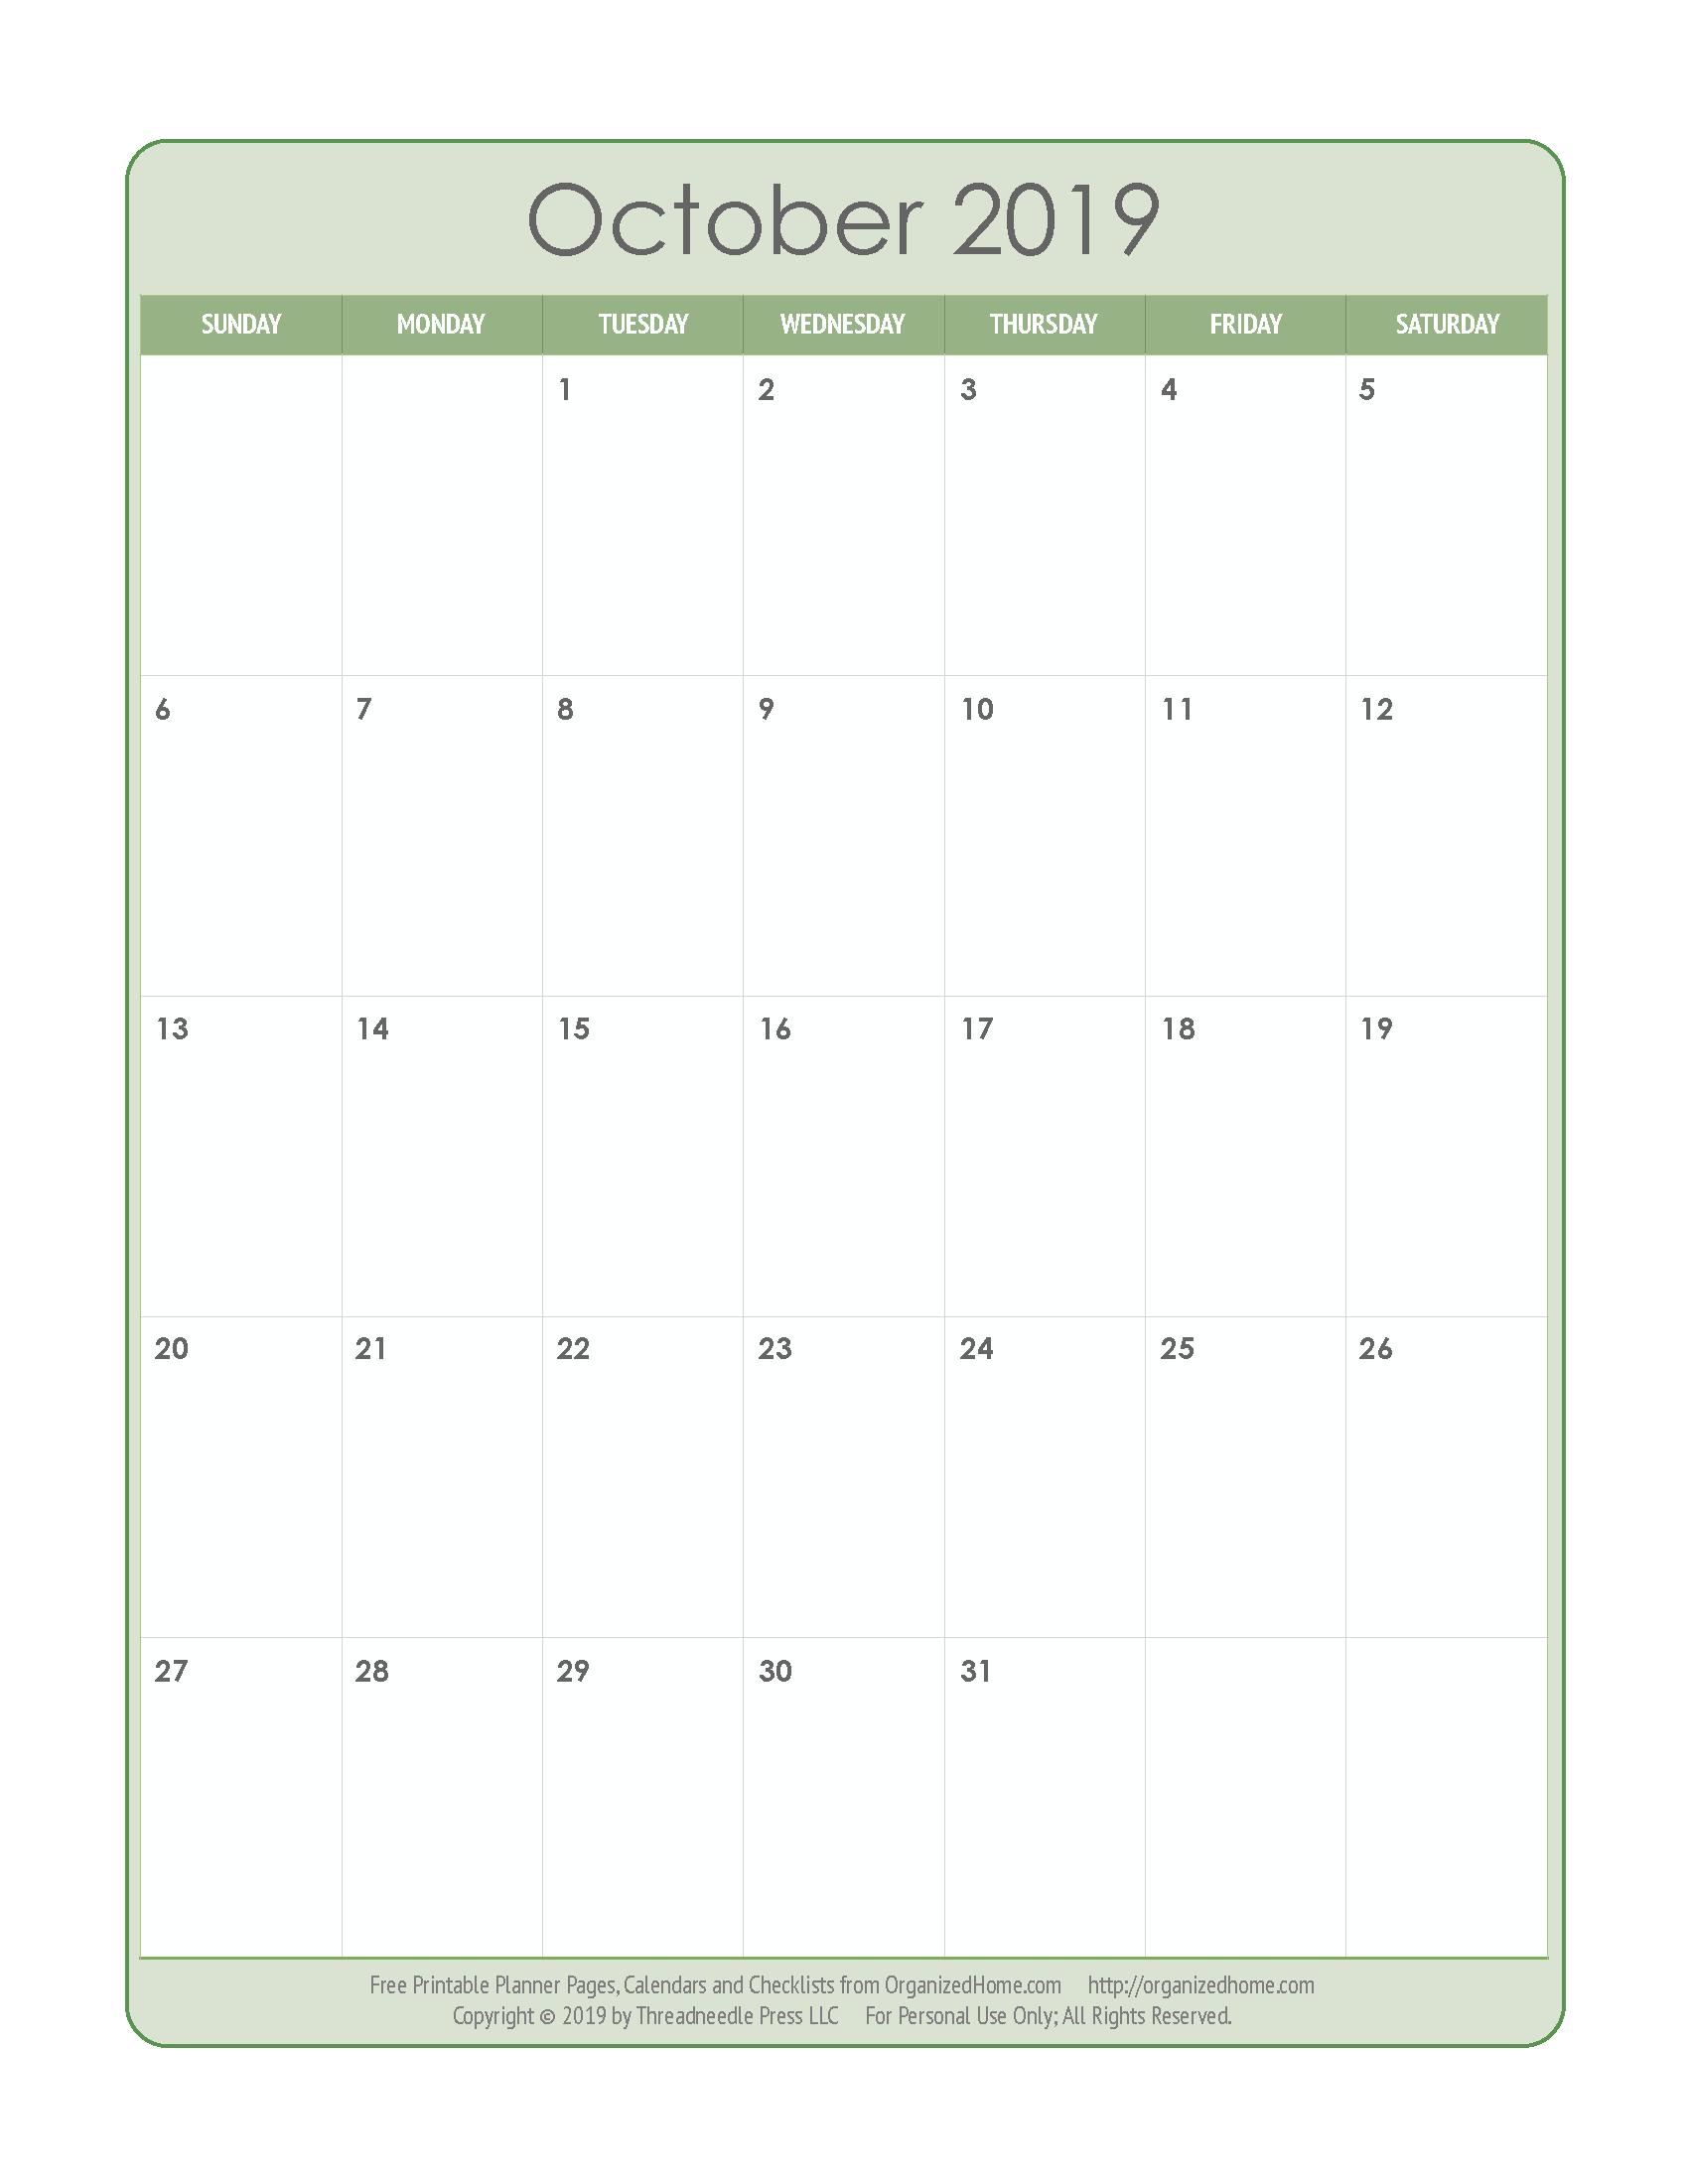 October 2019 Calendar | Organized Christmas